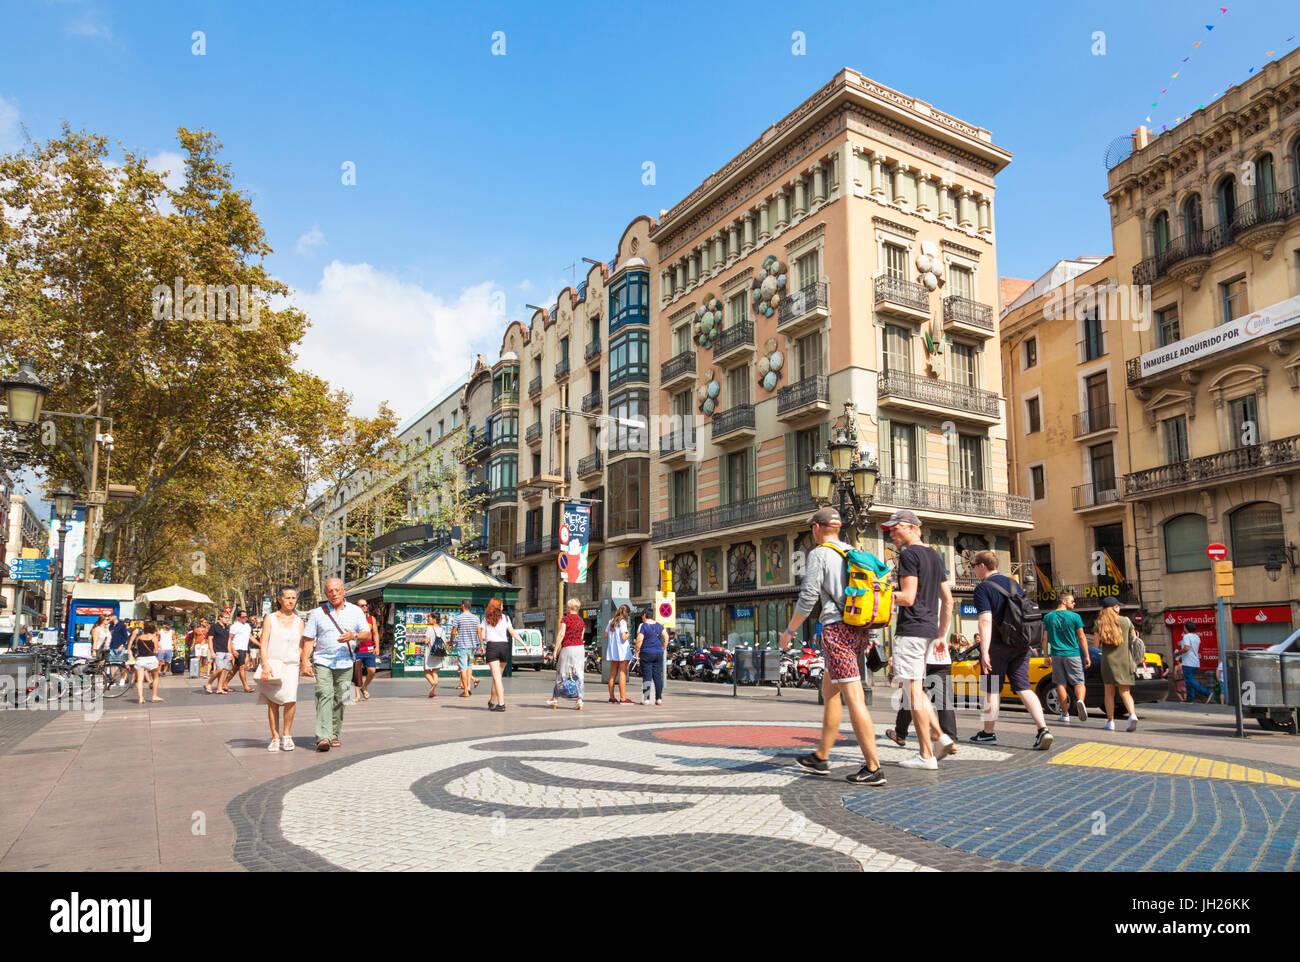 La mosaïque de Miro de Barcelone sur La Rambla (Las Ramblas) boulevard, la promenade dans Barcelone, Catalogne (Catalunya), Espagne Banque D'Images